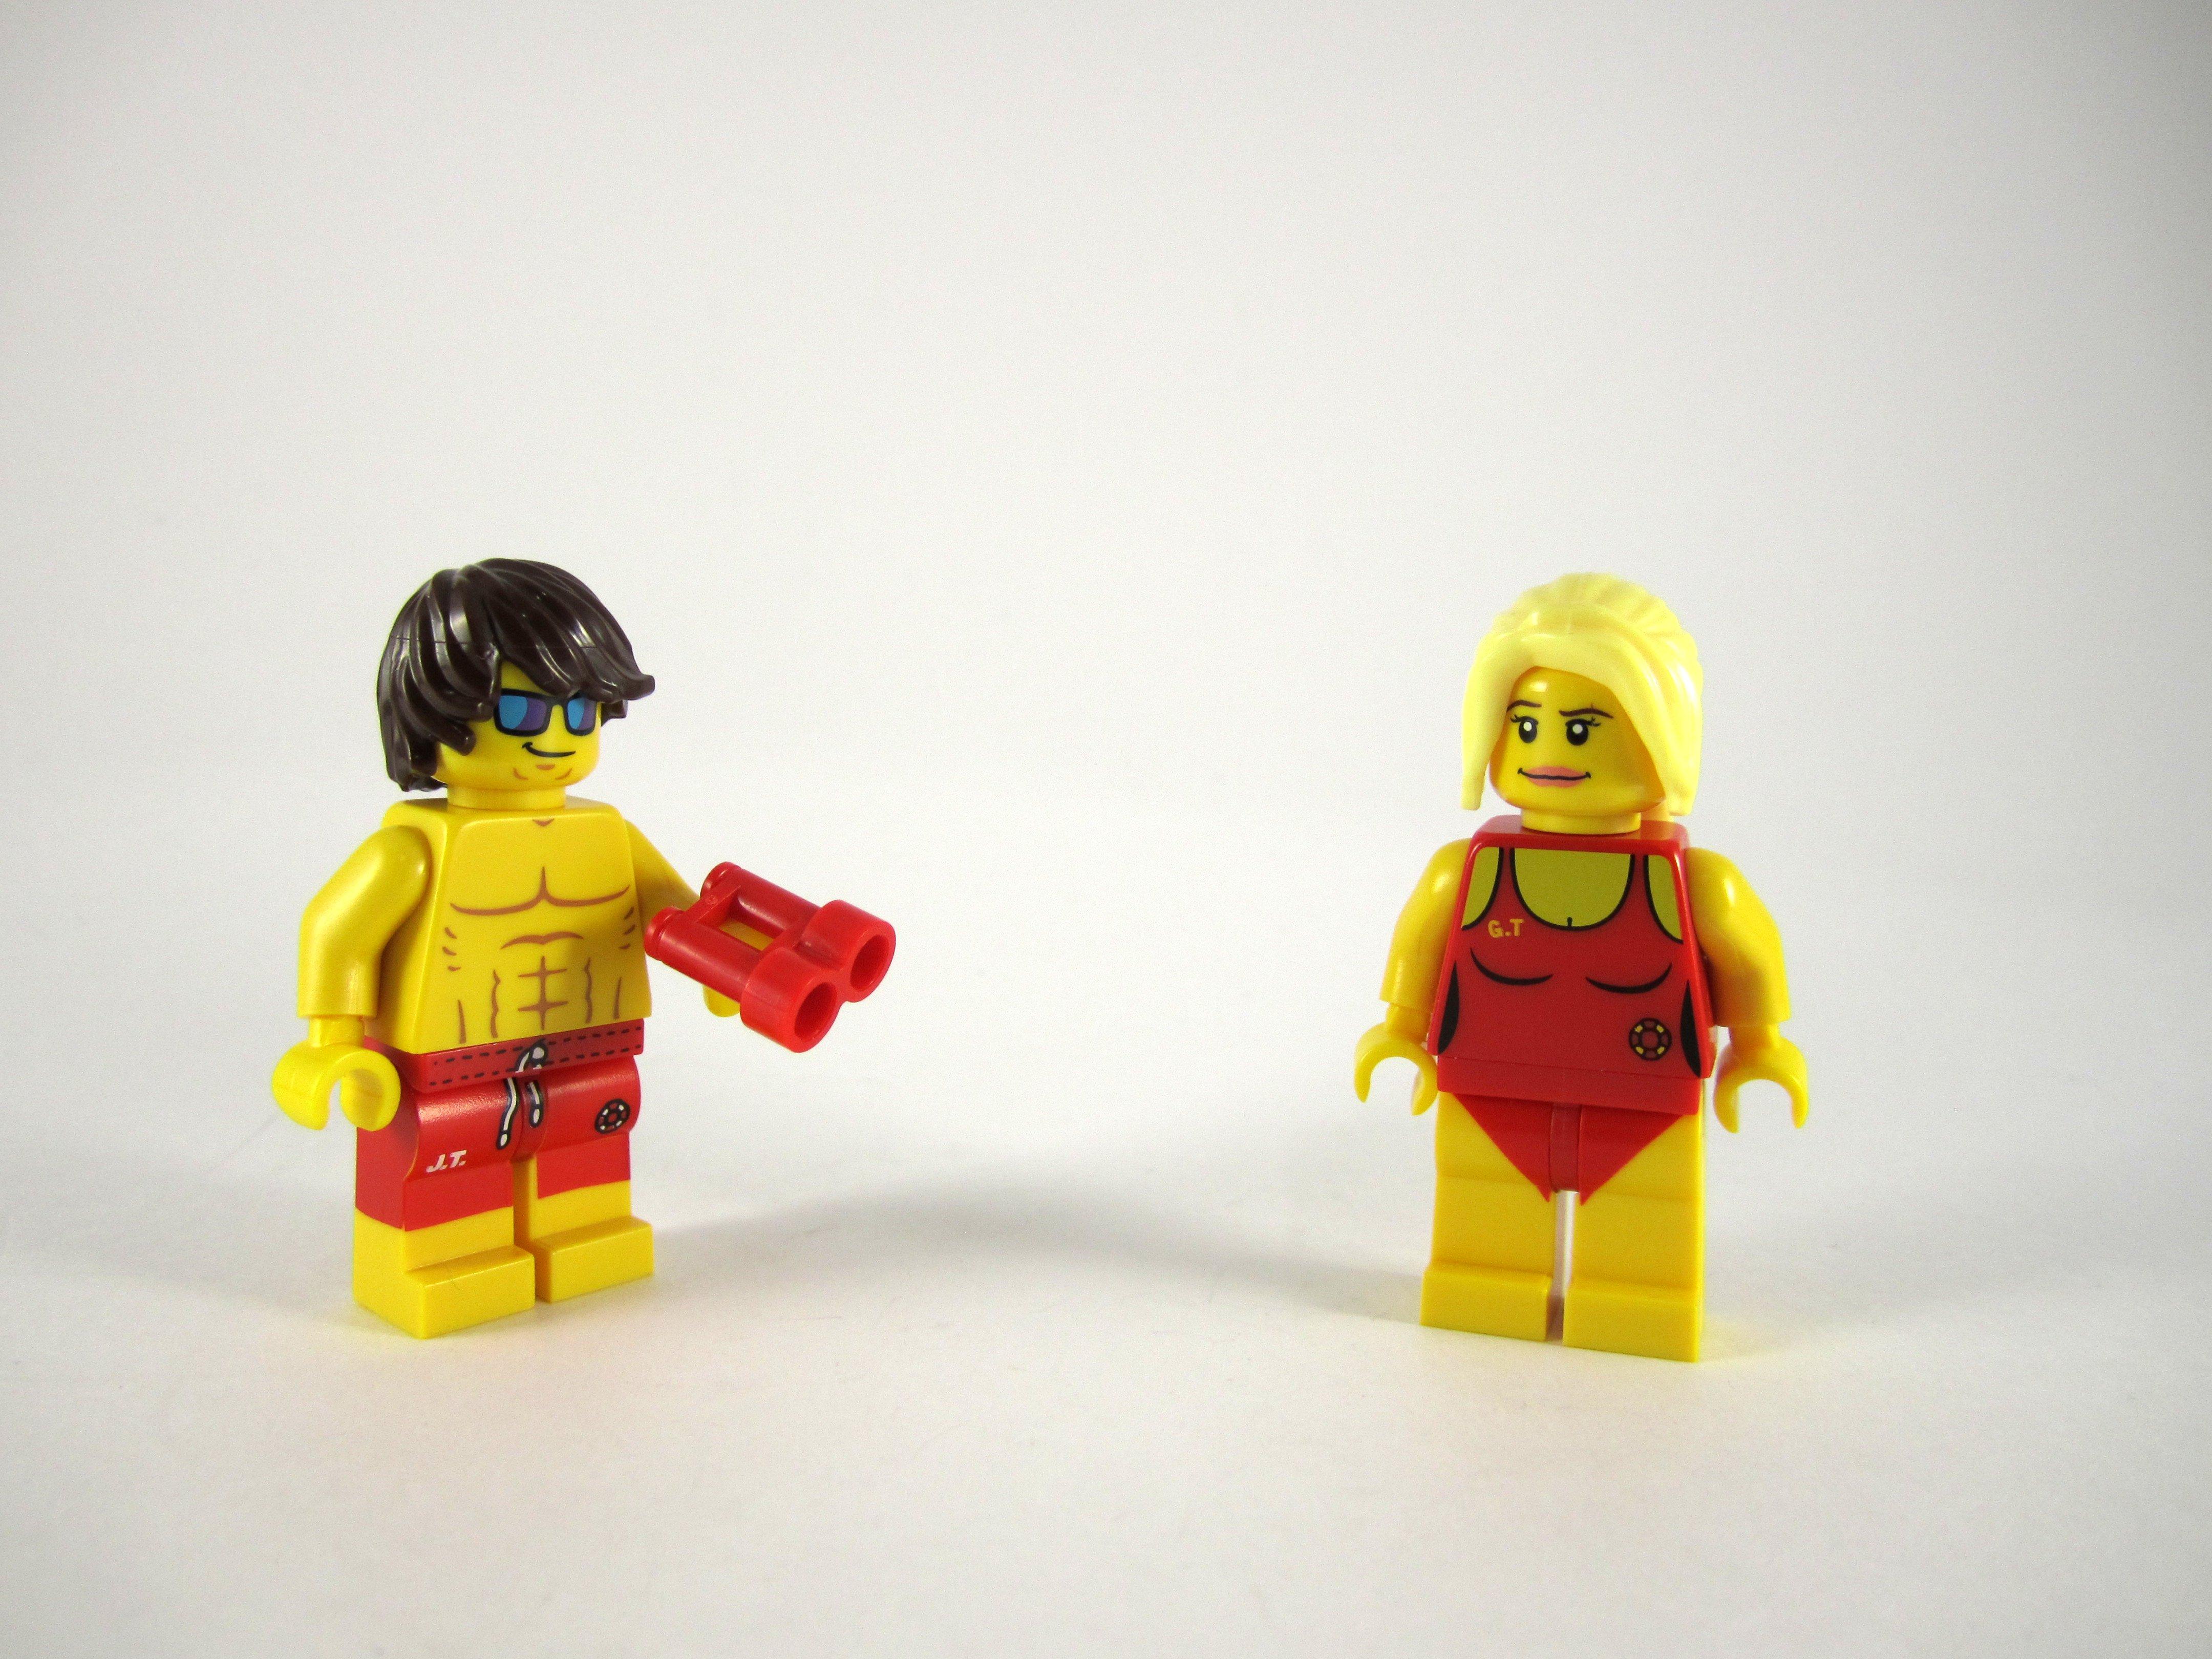 e598589a674eb Review  LEGO Minifigures Series 12 Part 2 – Jay s Brick Blog